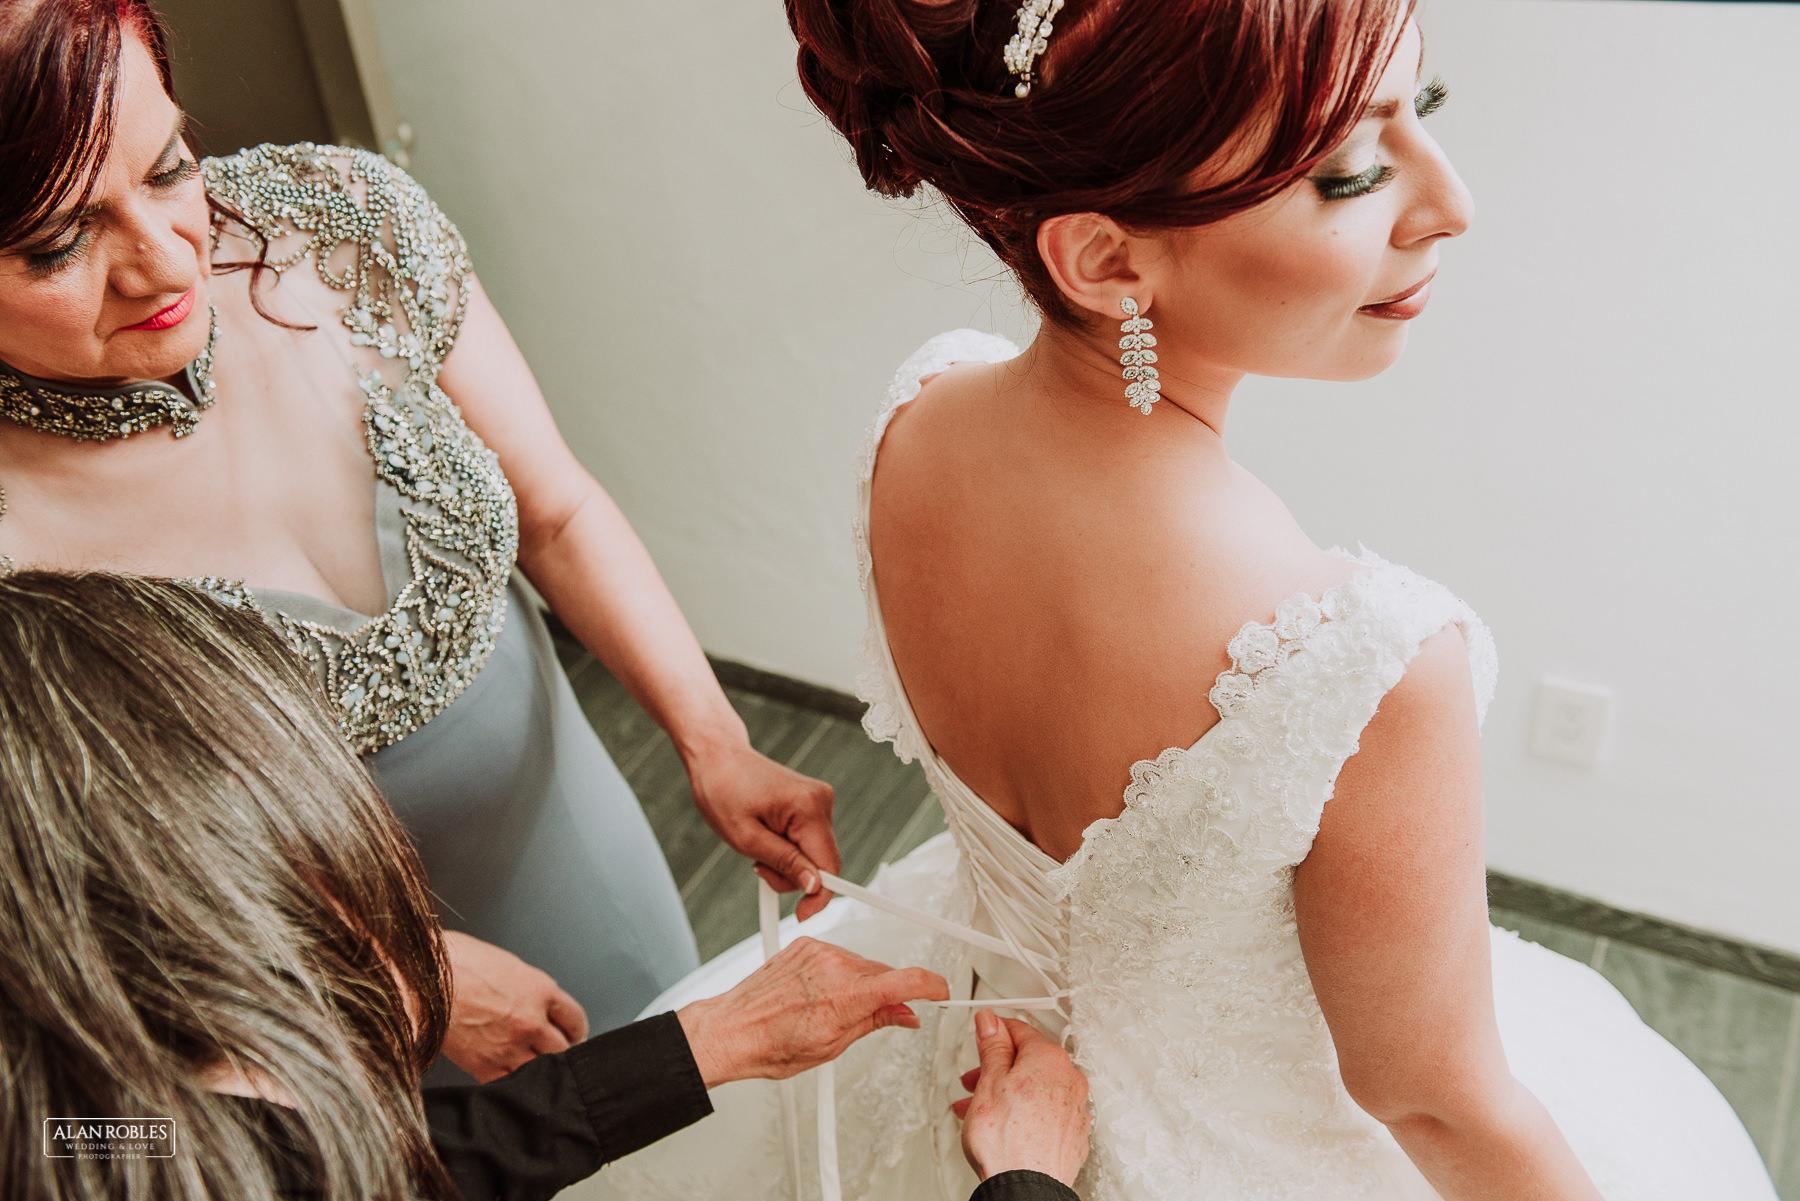 Alan Robles fotografo de bodas guadalajara - LyP Hotel Demetria-18